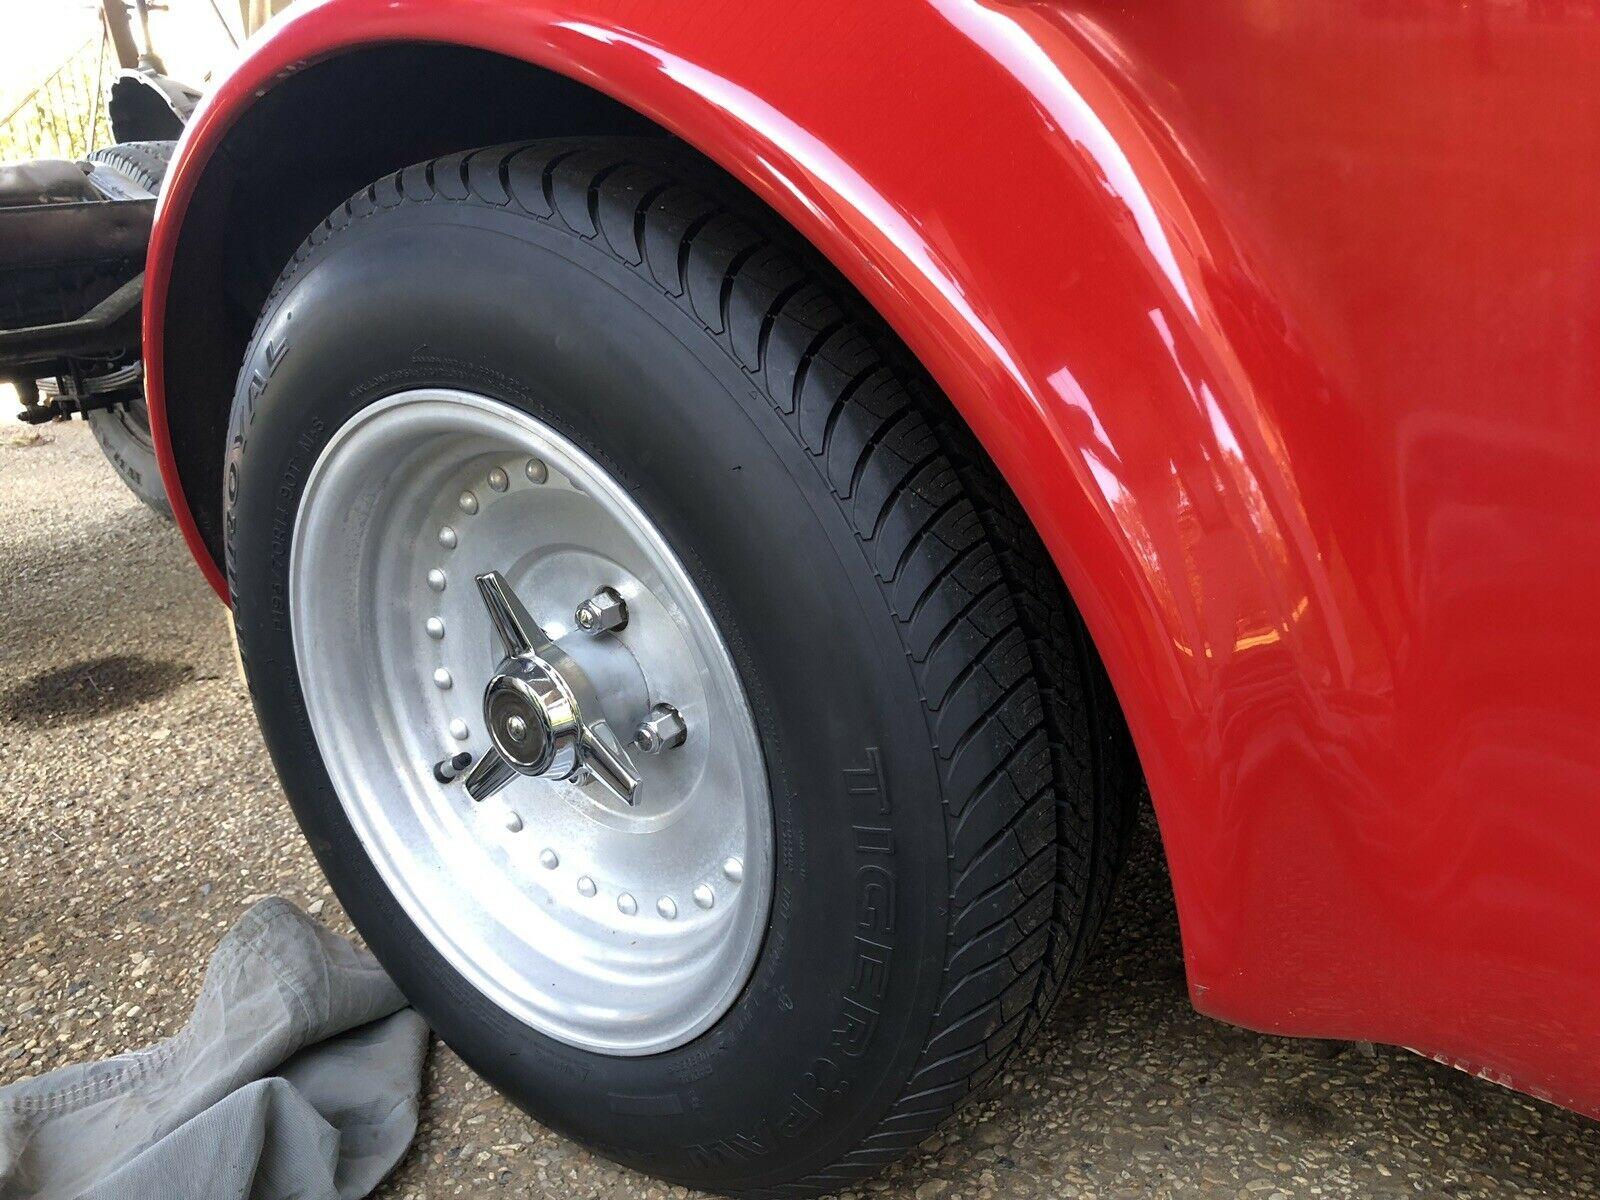 1962 Austin Healey 3000 wheel detail